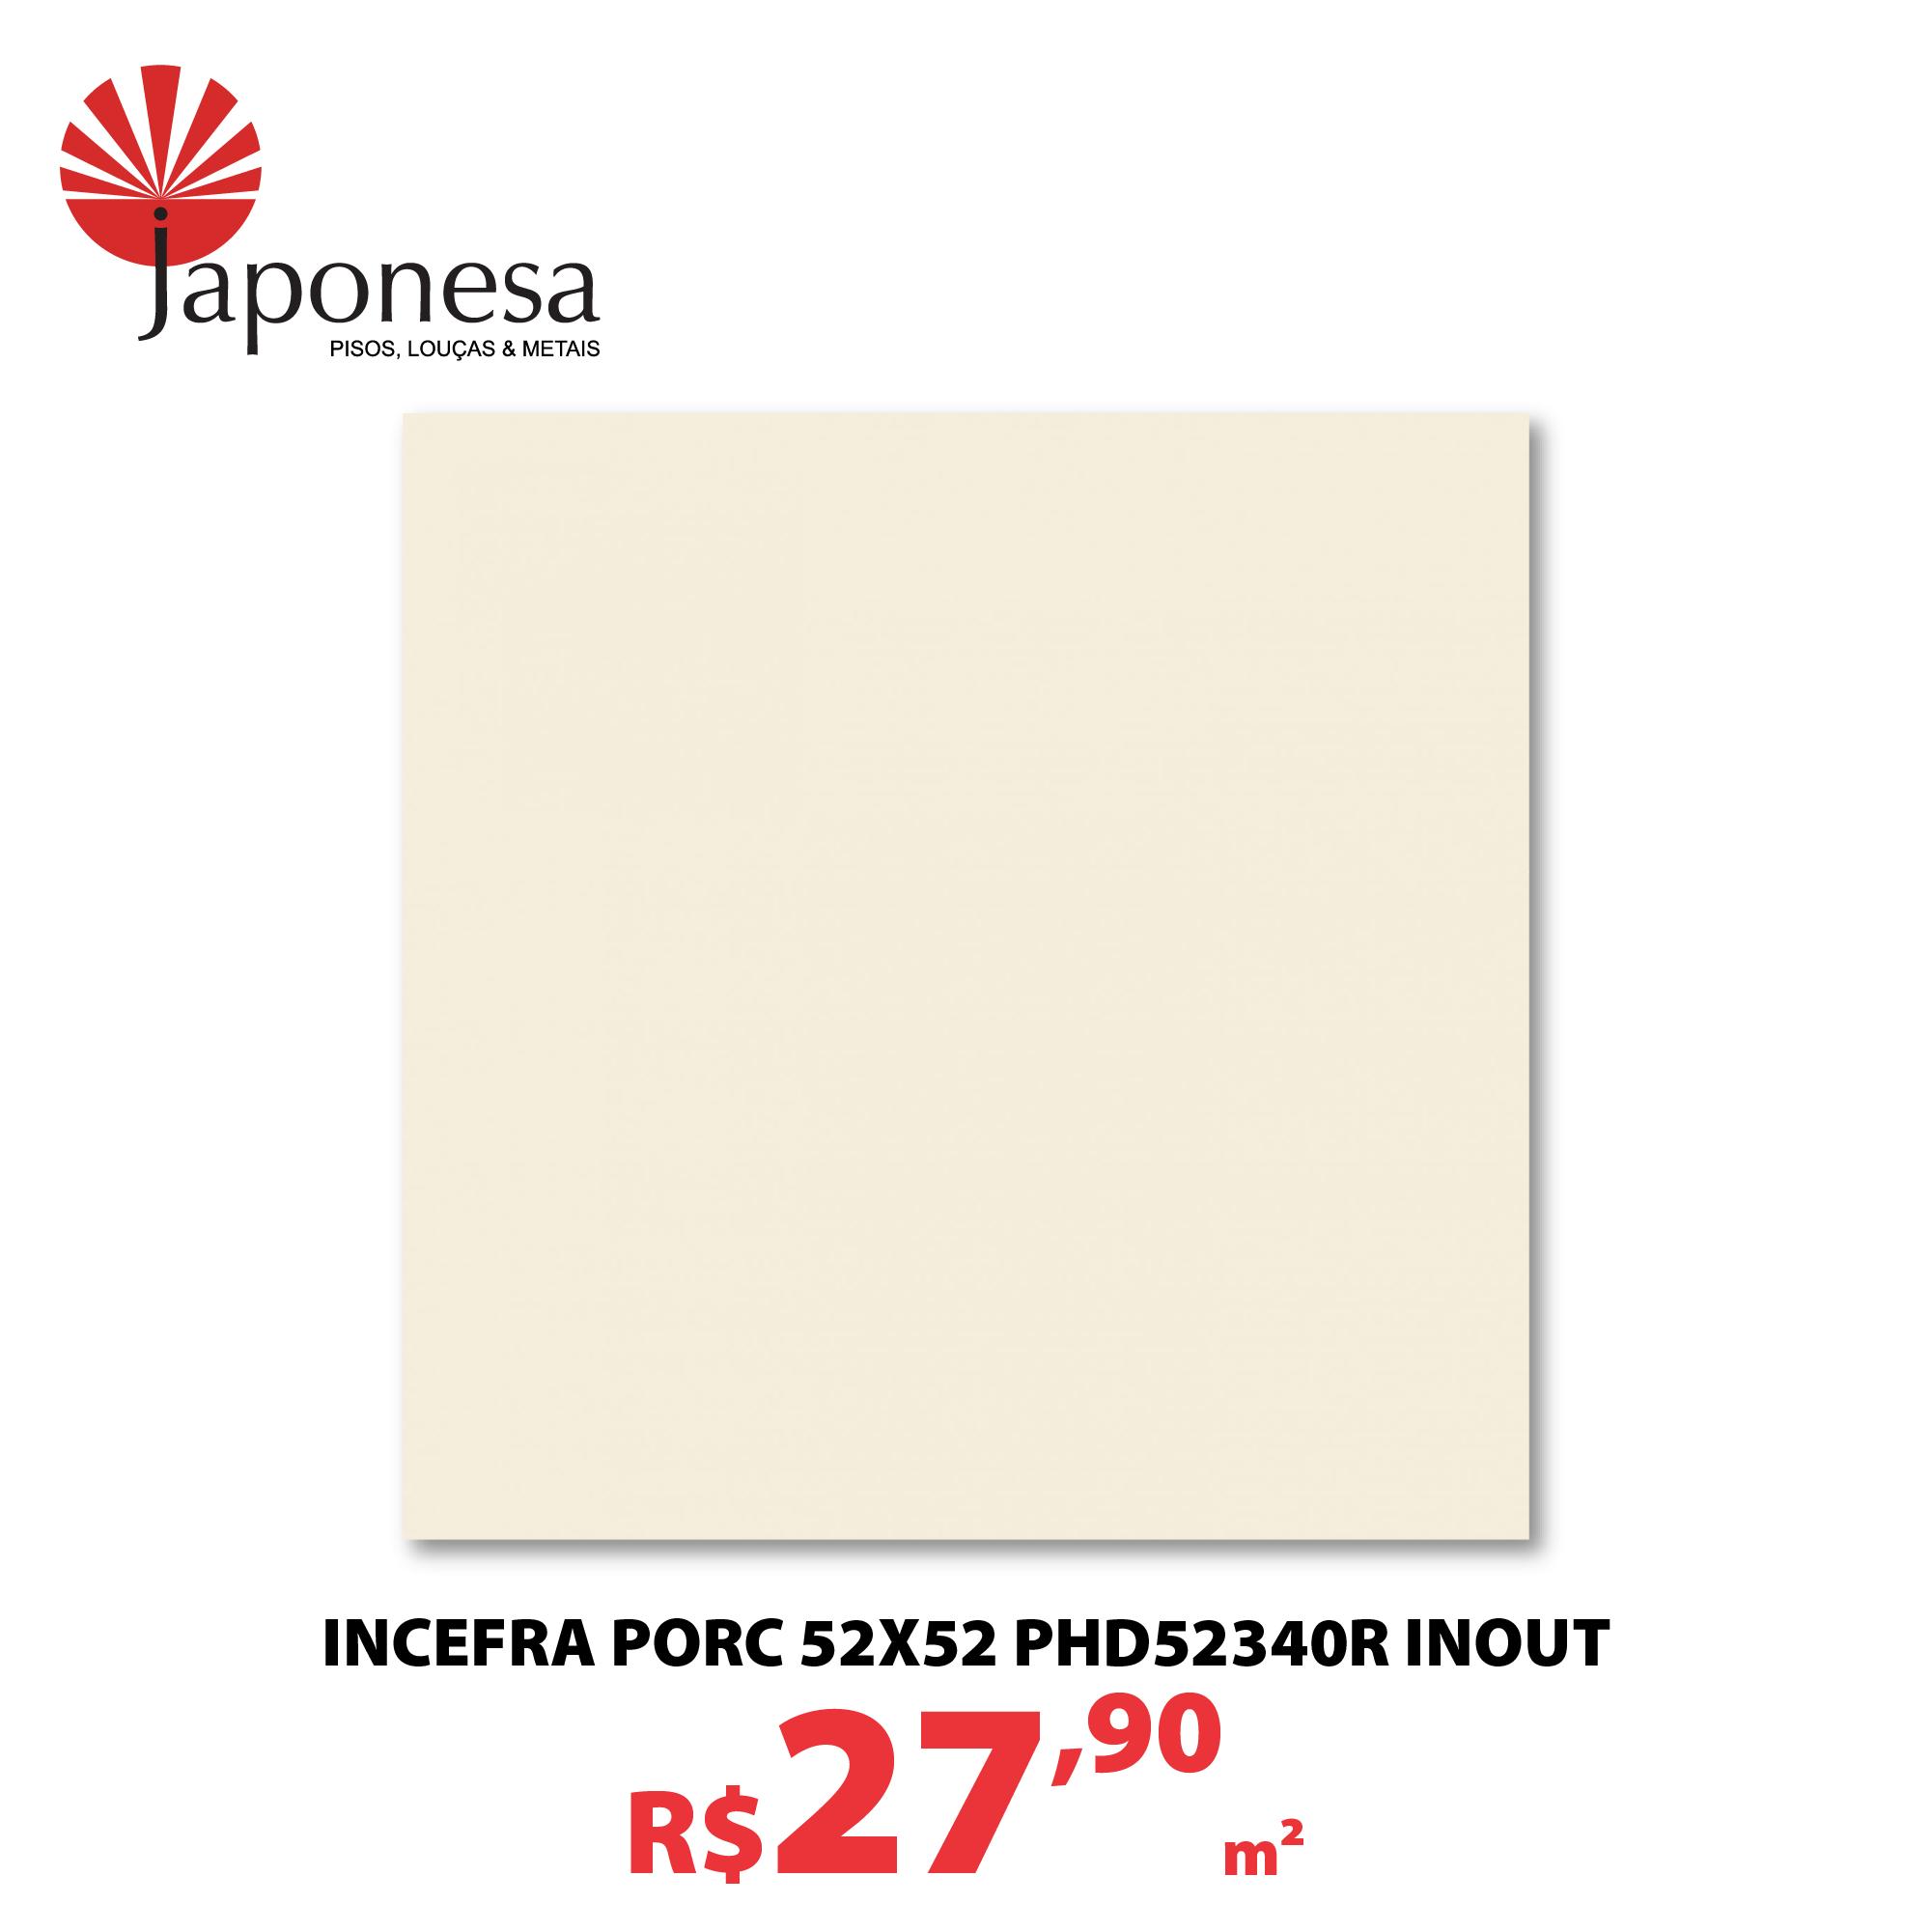 INCEFRA PORC 52X52 PHD52340R INOUT